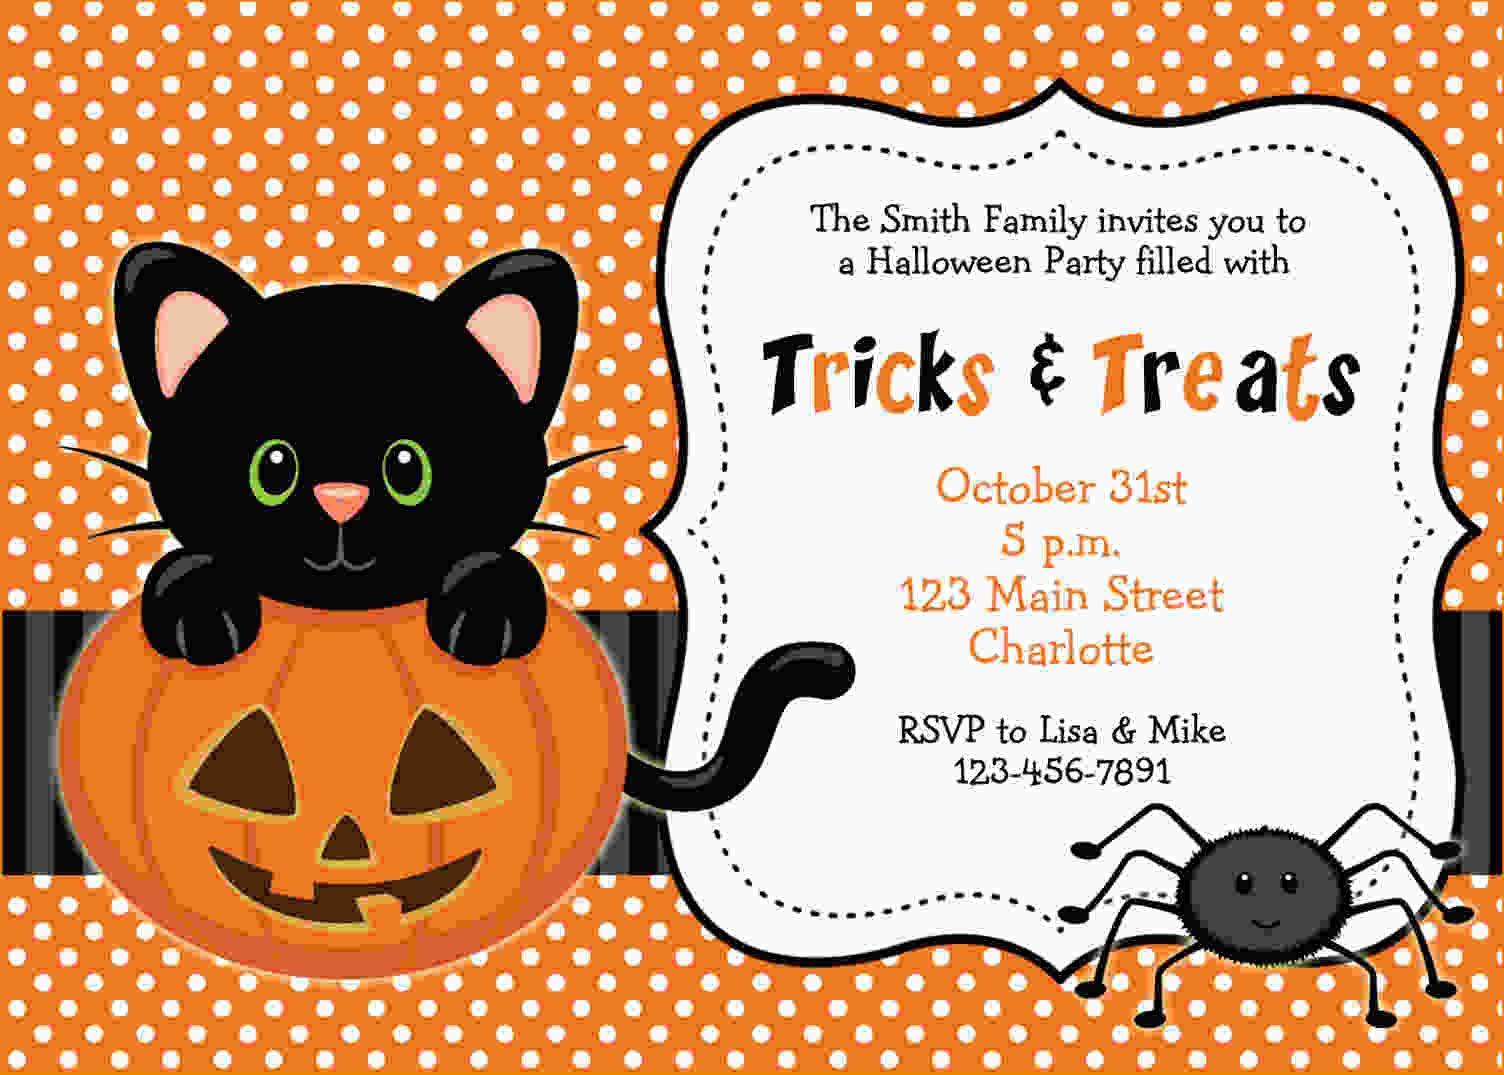 Free Printable Halloween Invitations | Free Printable Birthday - Free Printable Halloween Invitations